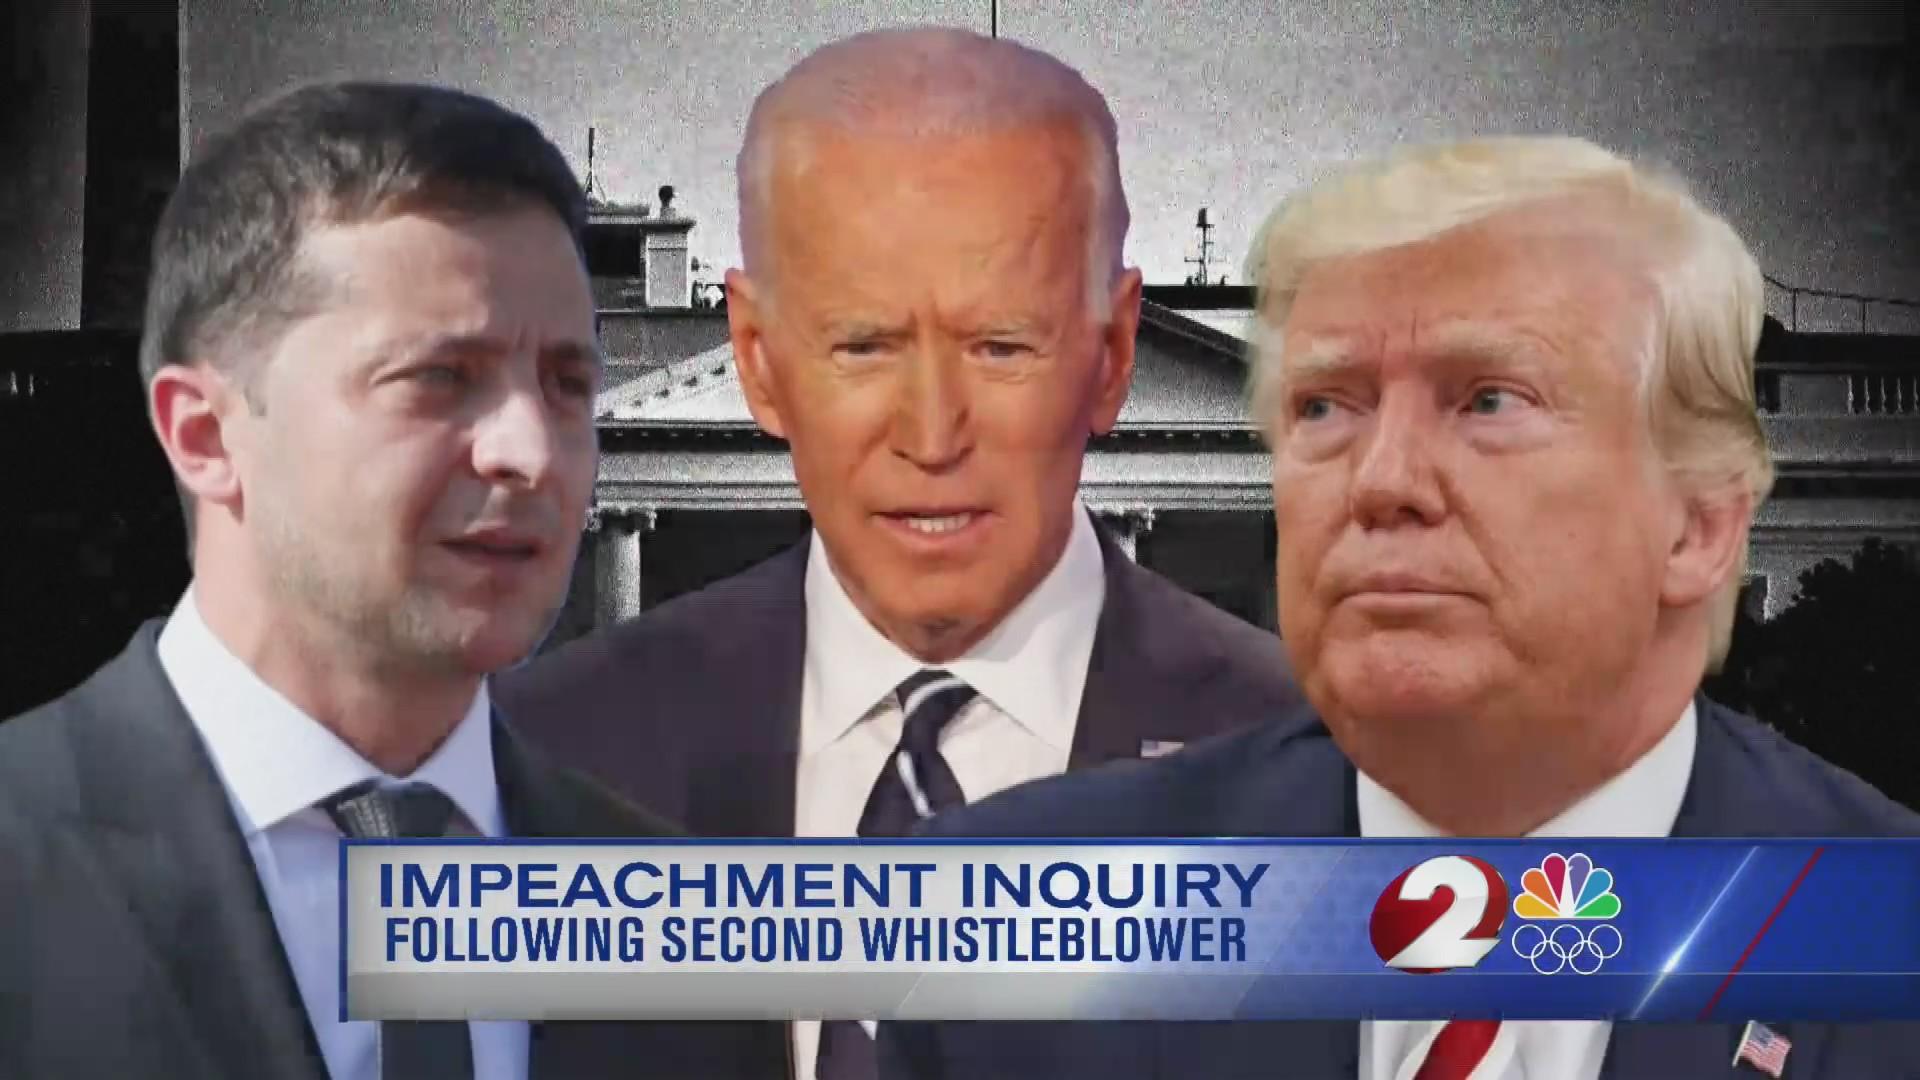 Impeachment inquiry following second whistleblower